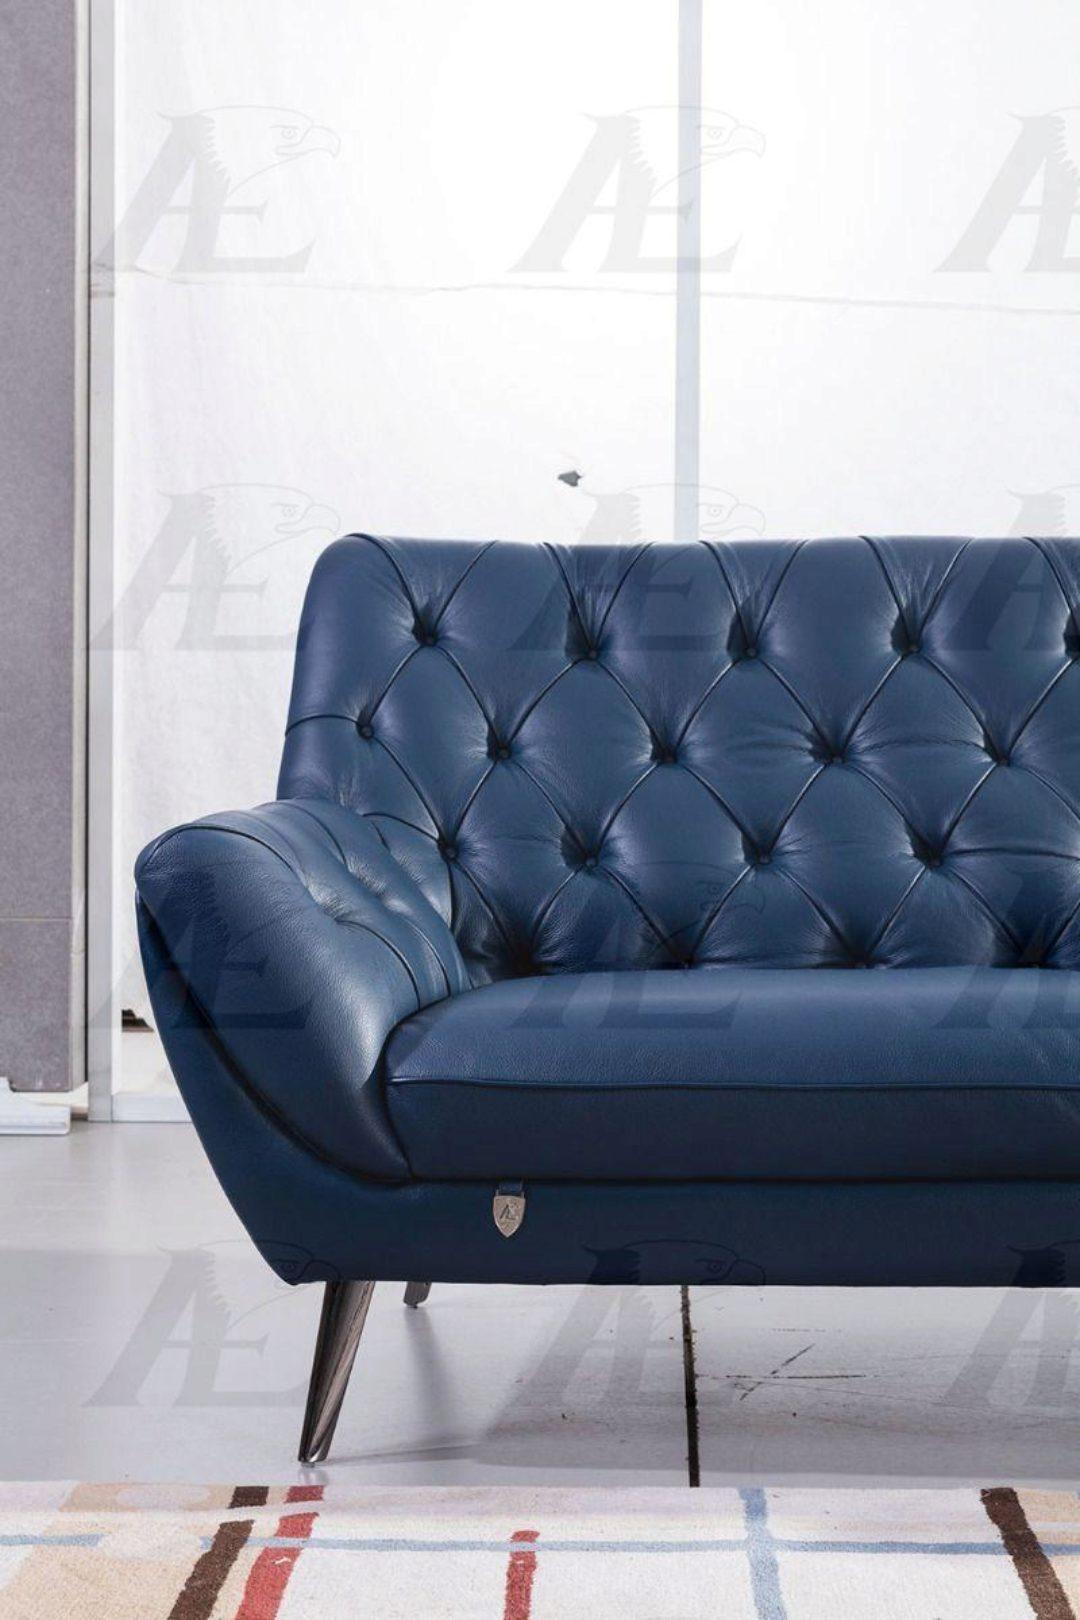 Modern Navy Blue Italian Leather Sofa Set 3pcs American Eagle Ek8003 Nb Ek8003 Nb Set 3